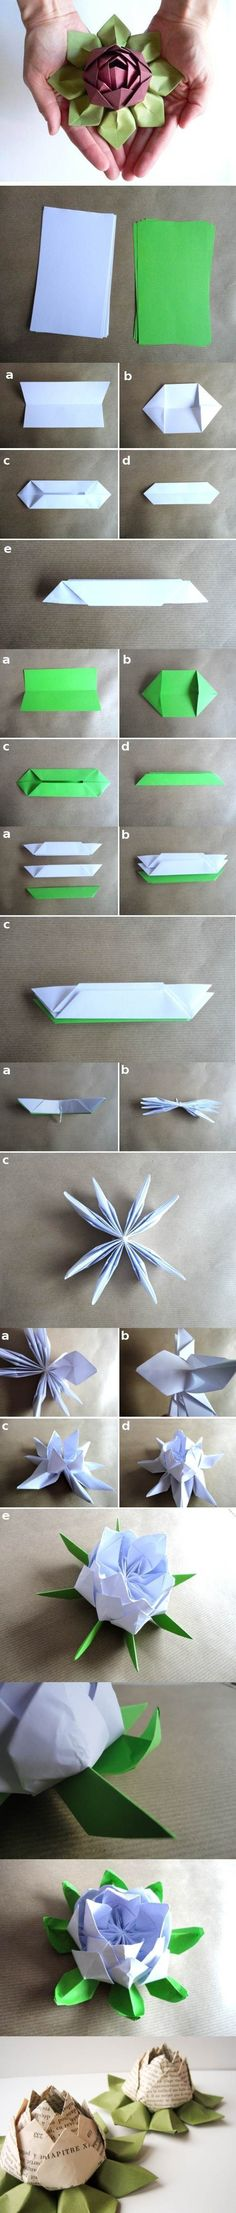 DIY #origami Lotus Flower | iCreativeIdeas.com Like Us on Facebook ==> www.facebook.com/...